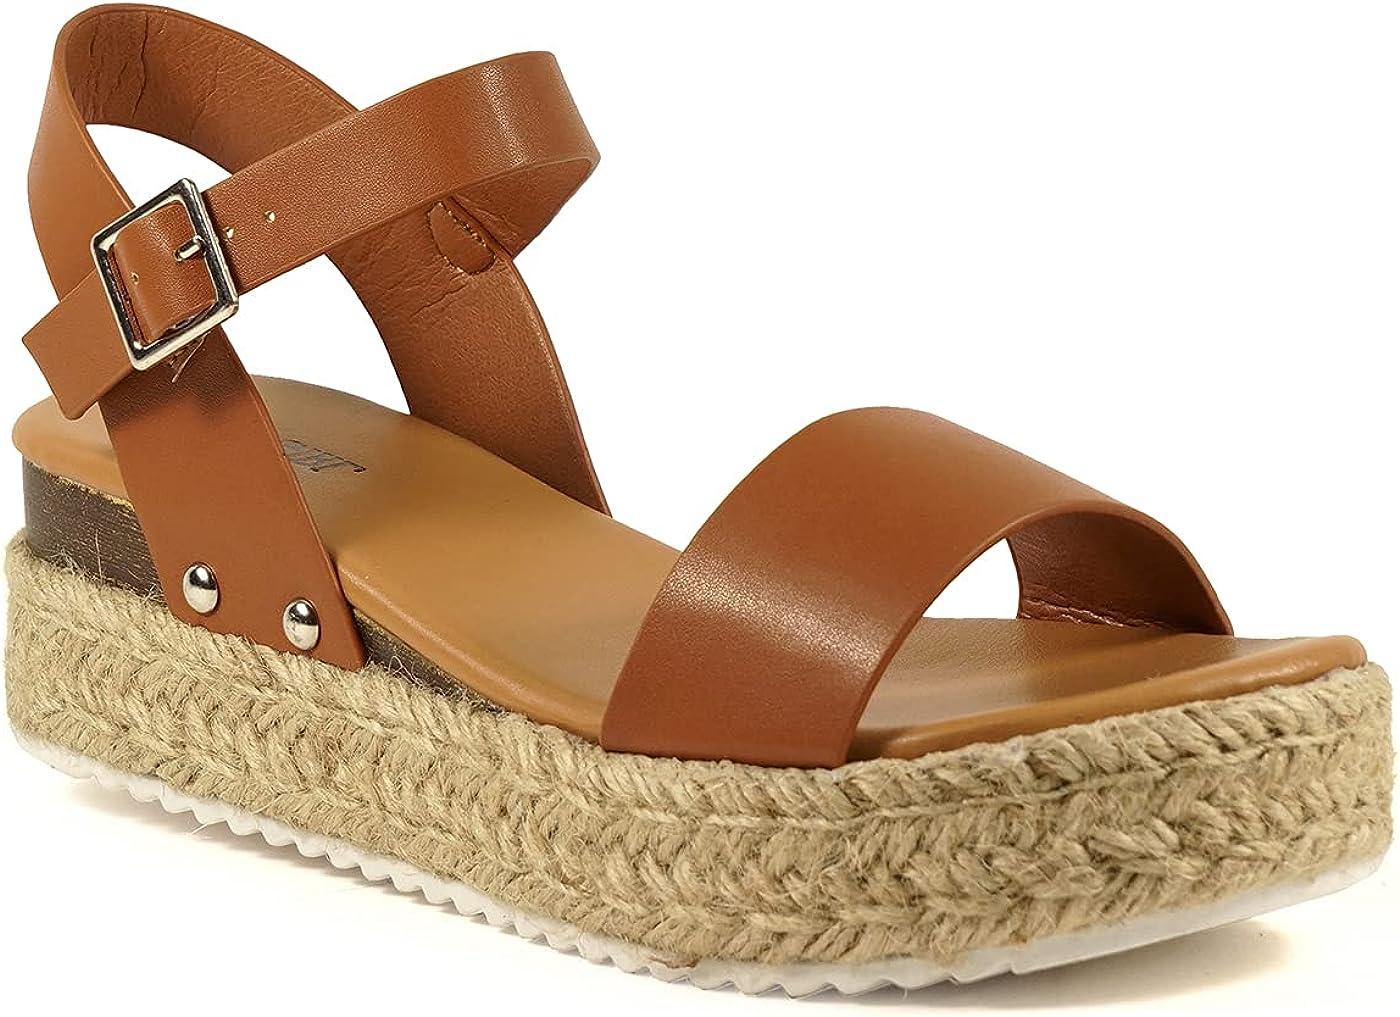 COZZY GIRL Hope Women Platform Jute Woven Wedges Sandals Ankle Strap Open Toe Casual Sandals